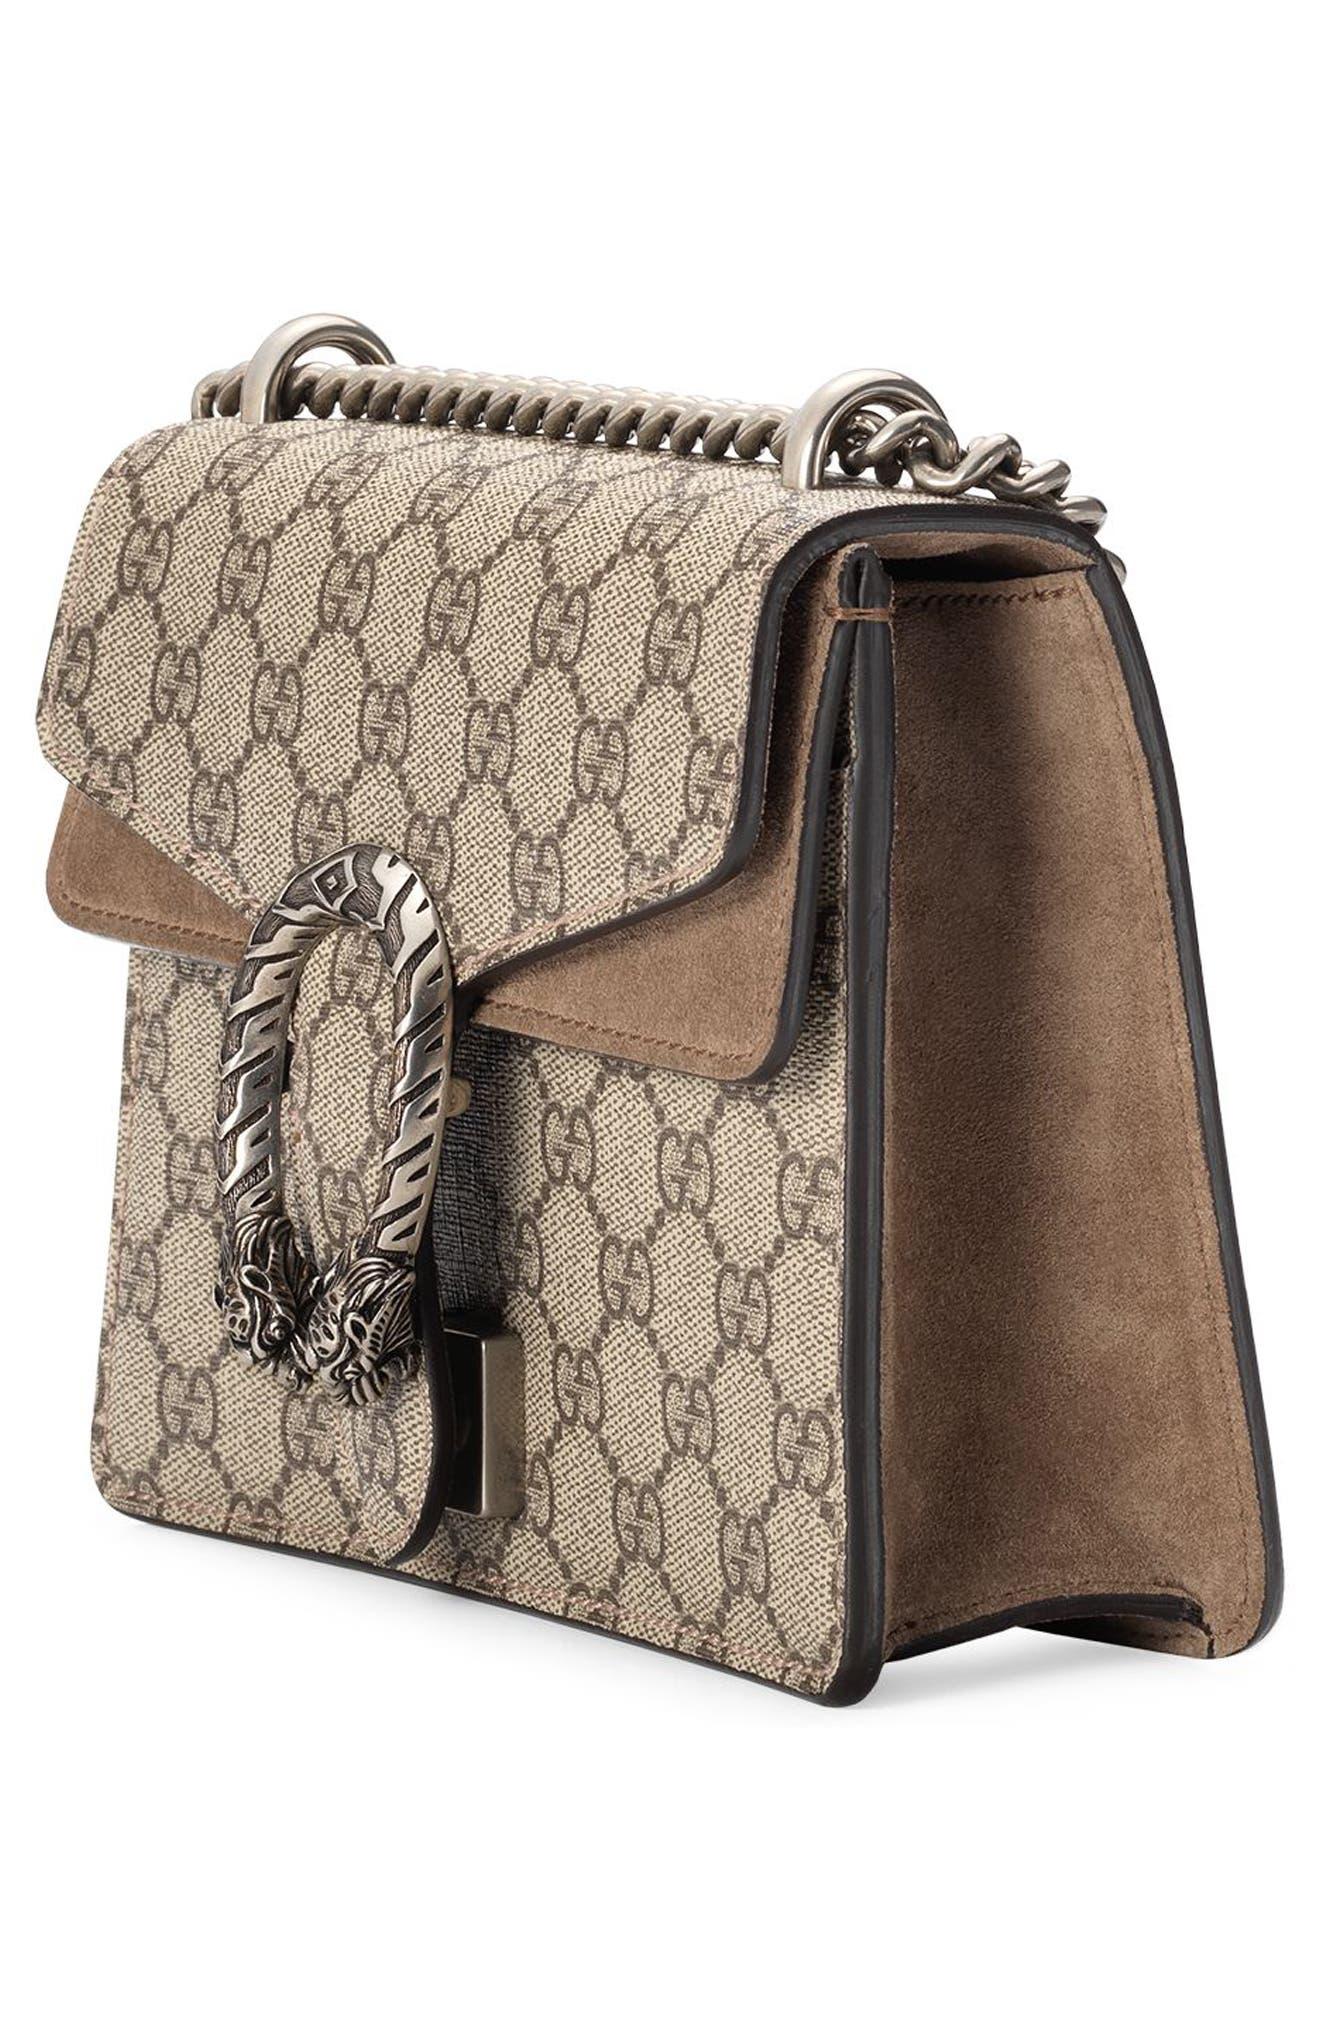 GUCCI, Mini Dionysus GG Supreme Shoulder Bag, Alternate thumbnail 5, color, BEIGE EBONY/ TAUPE